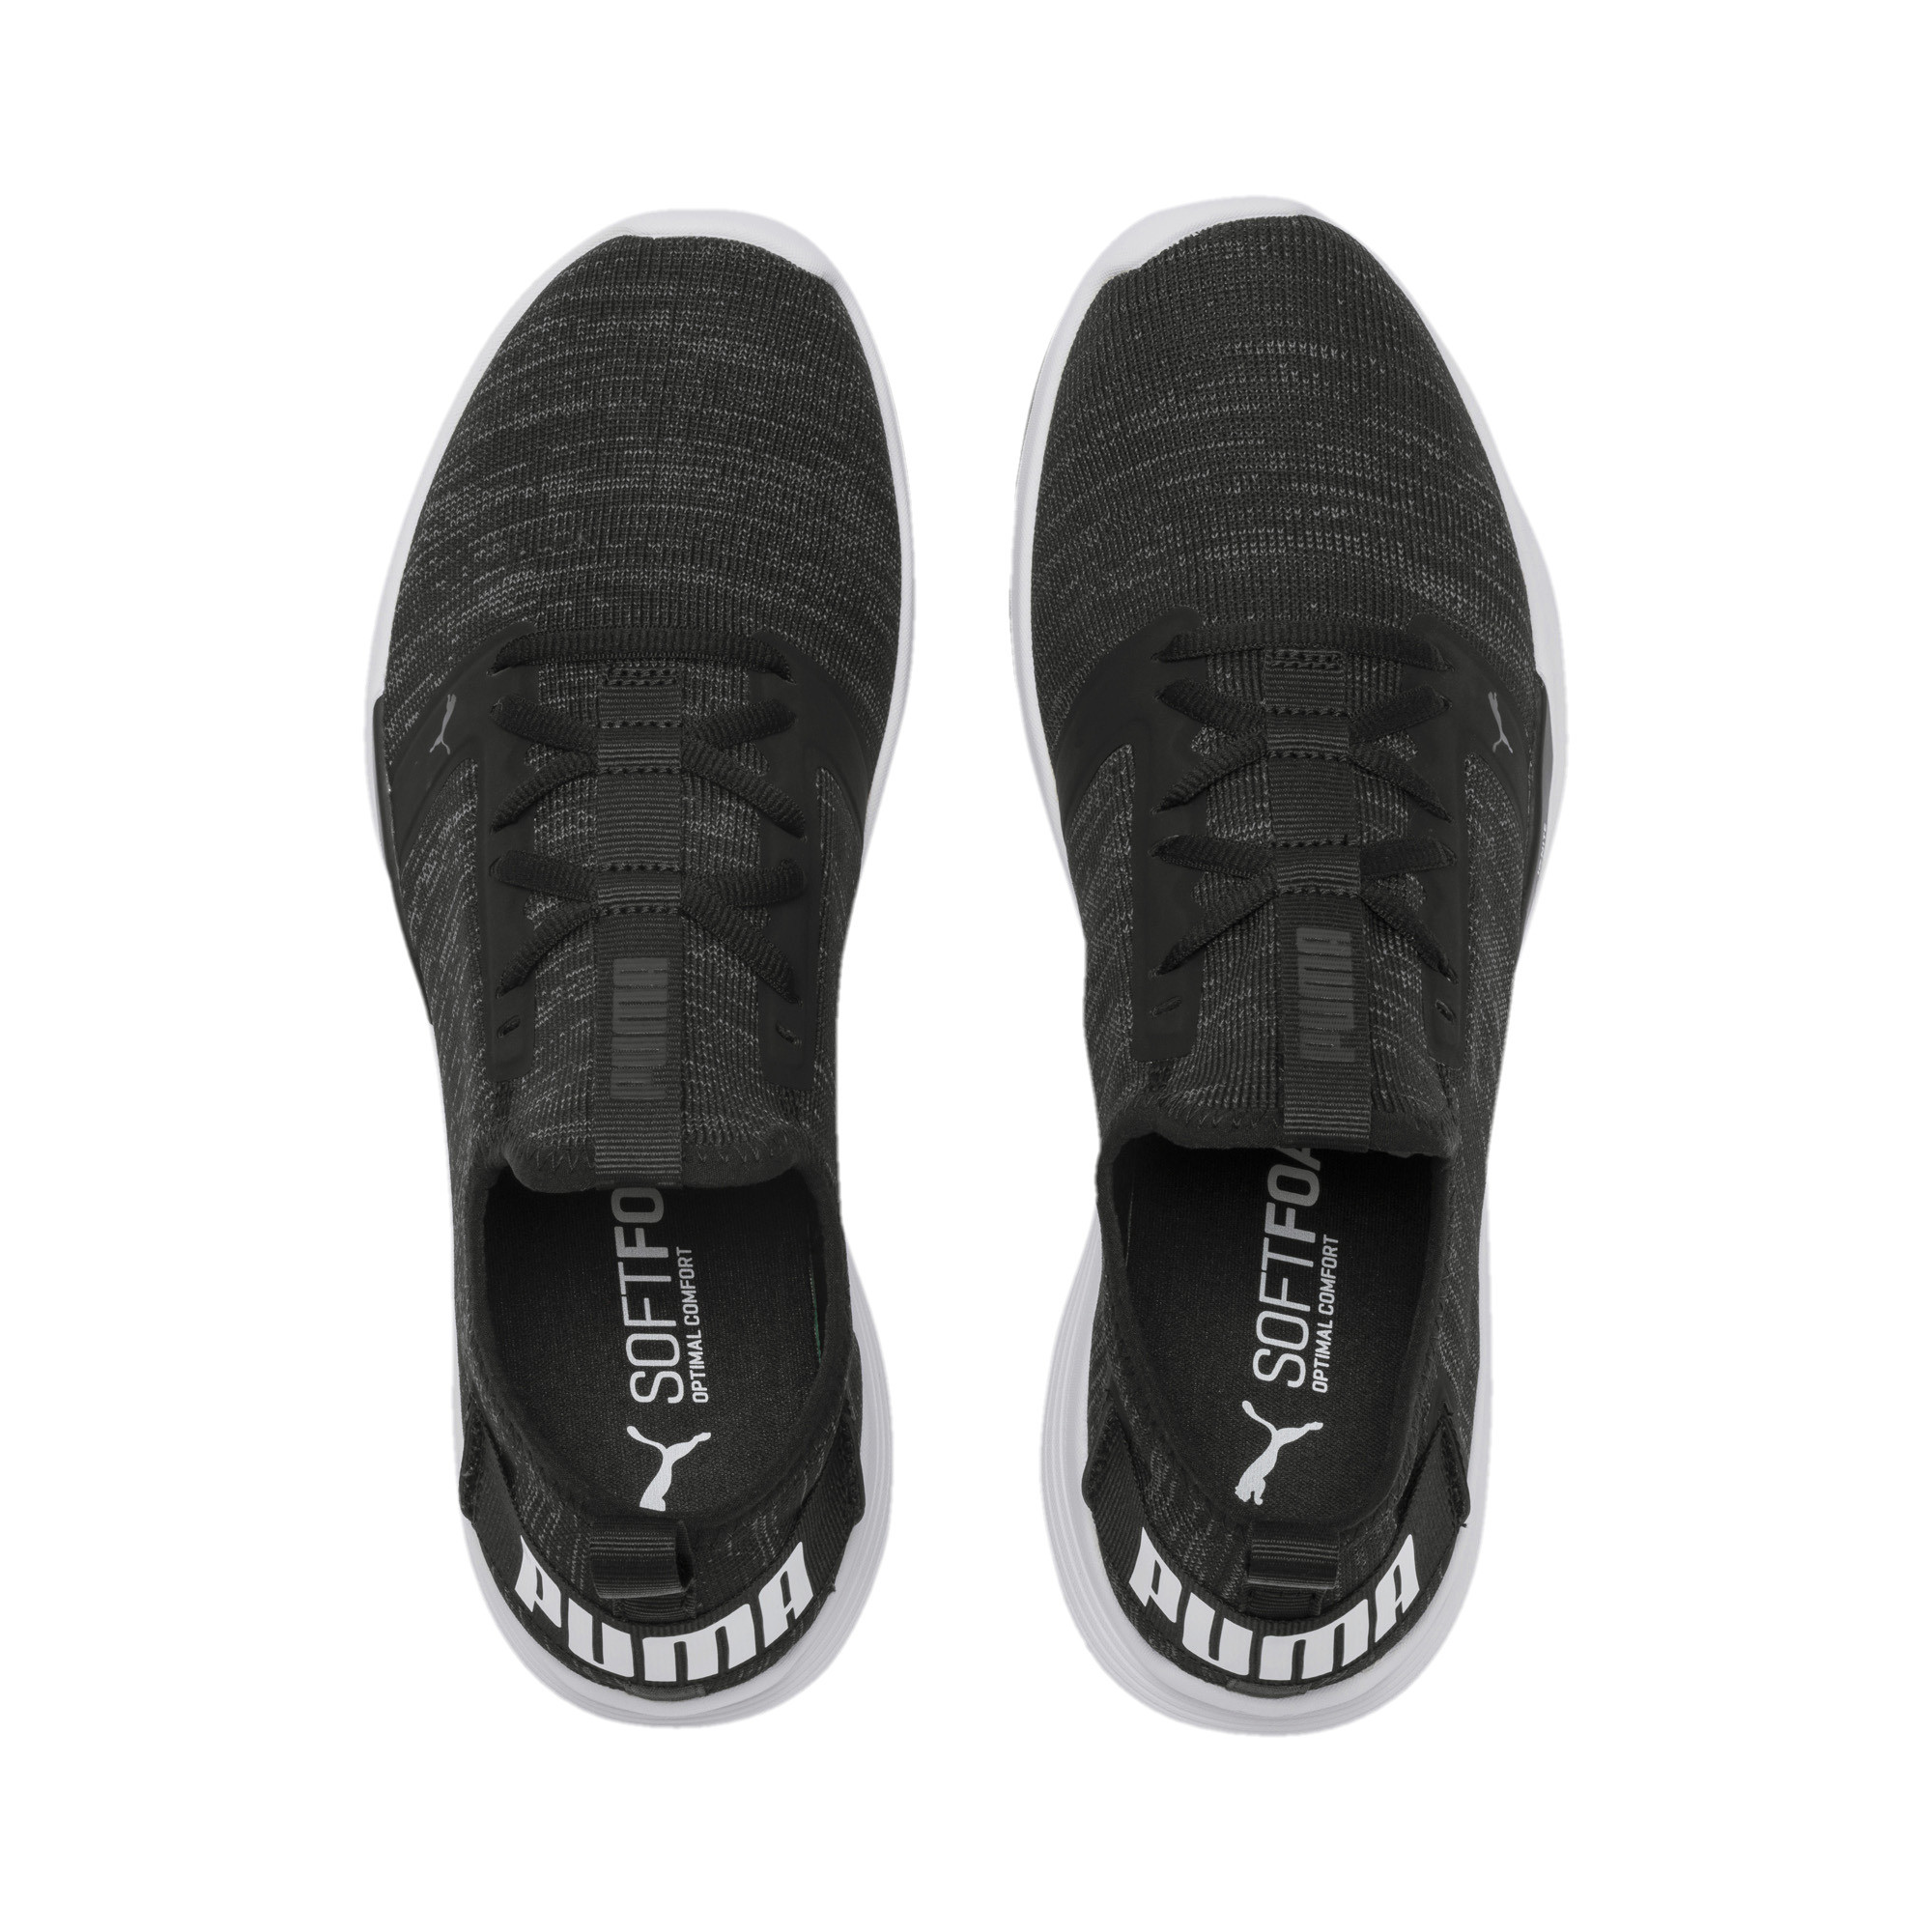 PUMA-Men-039-s-IGNITE-Contender-Knit-Running-Shoes thumbnail 13